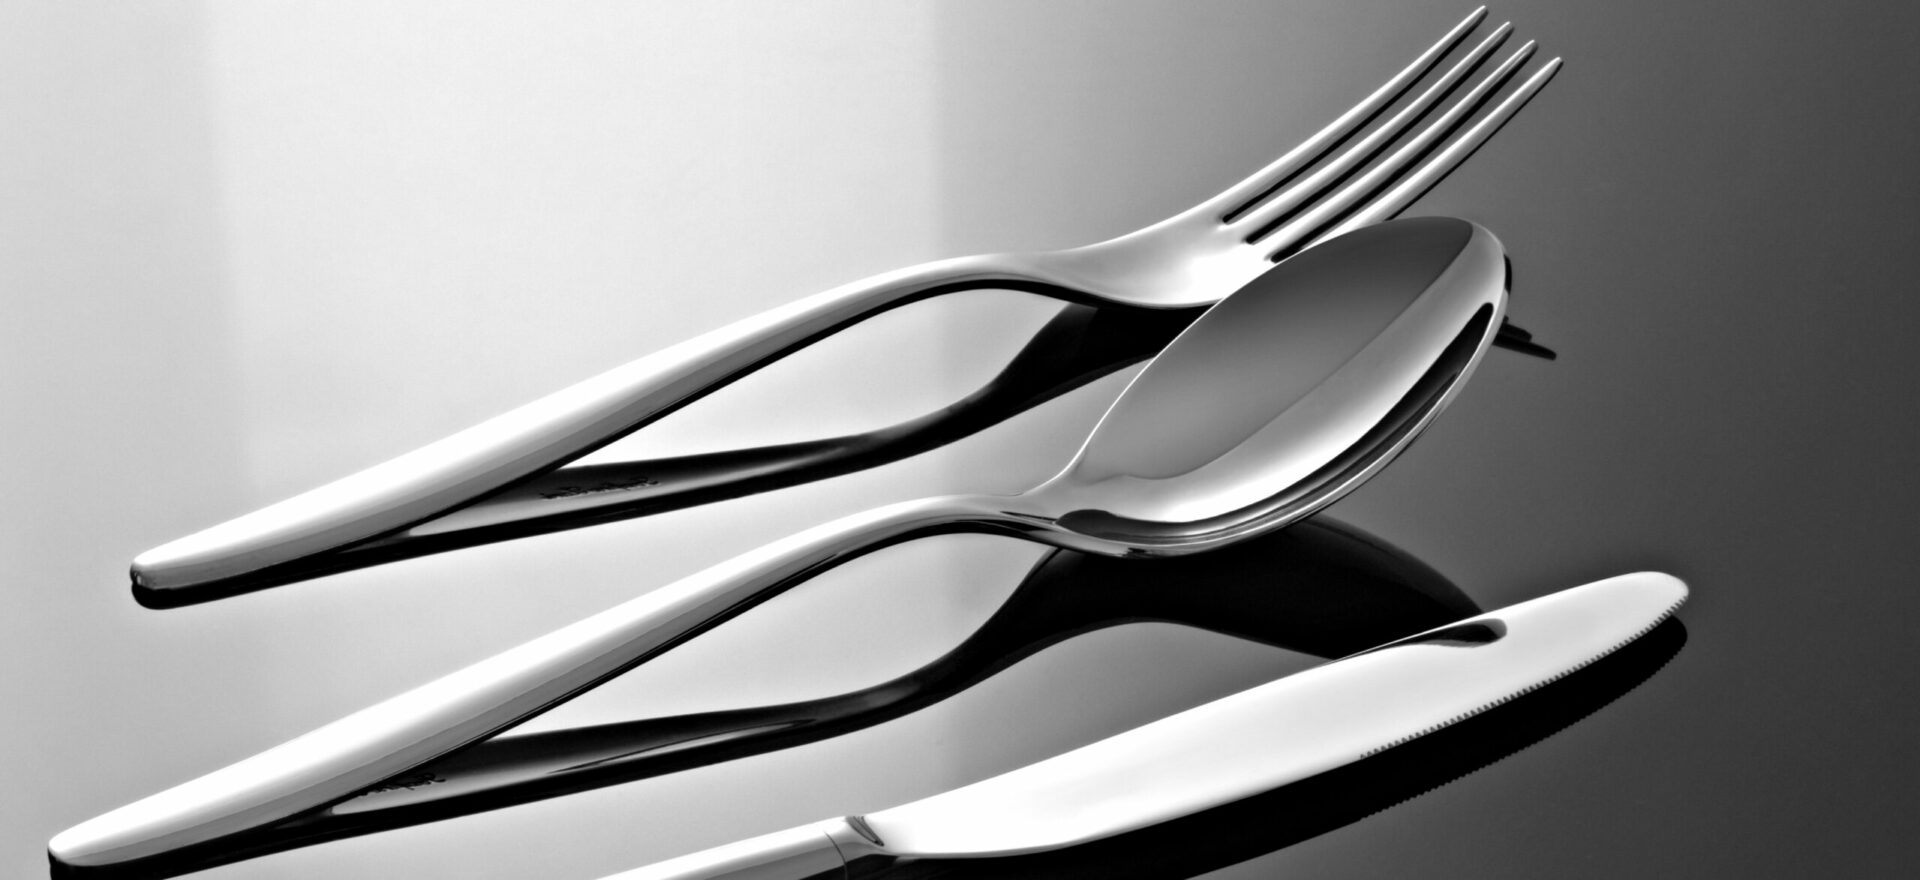 Elizabeth_Cutlery design_Serafino Zani_details_Mario Trimarchi Design_Santi Caleca